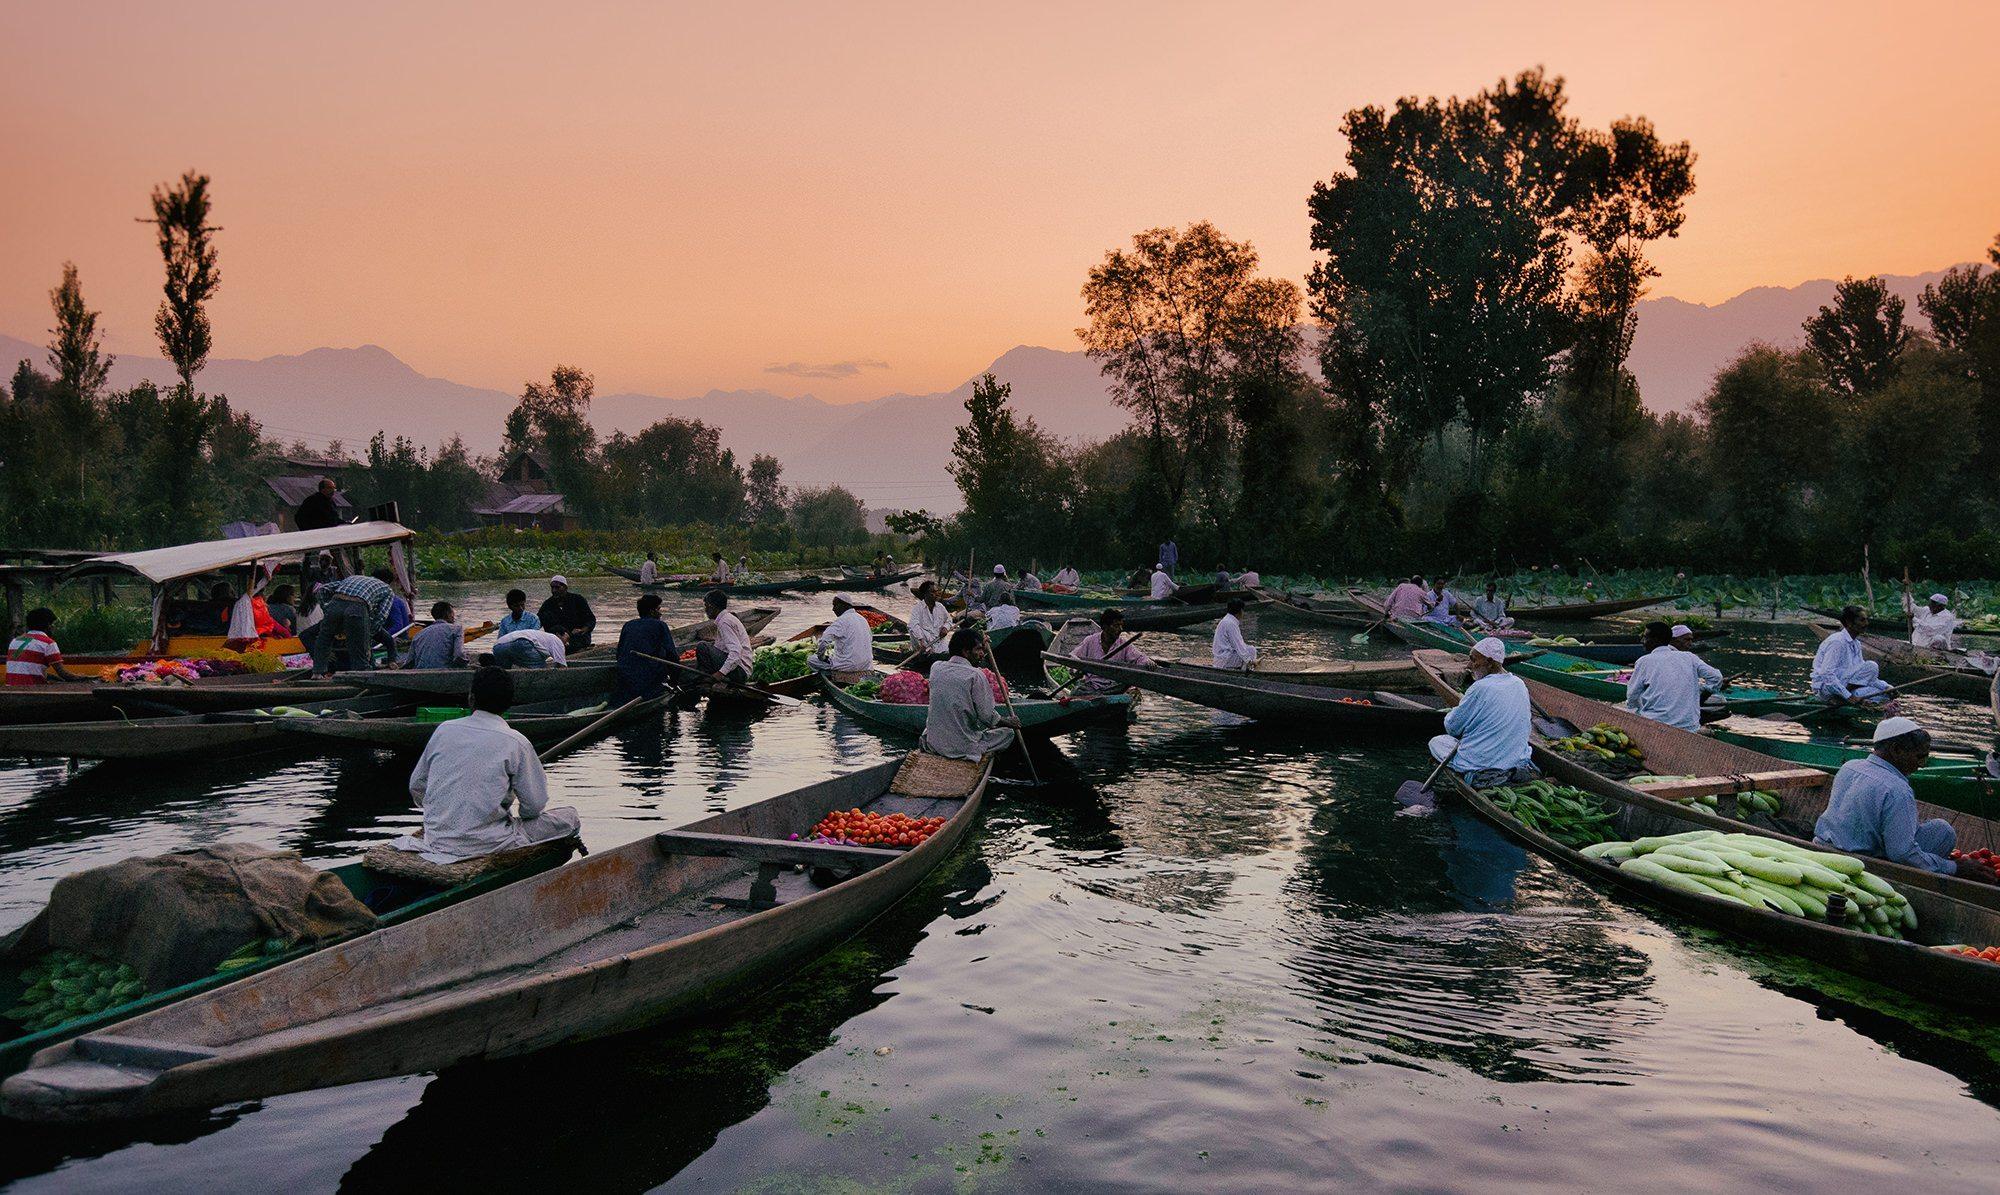 The dawn market and shikaras on Srinagar's Dal Lake - Kashmir ©Hamish Scott-Brown